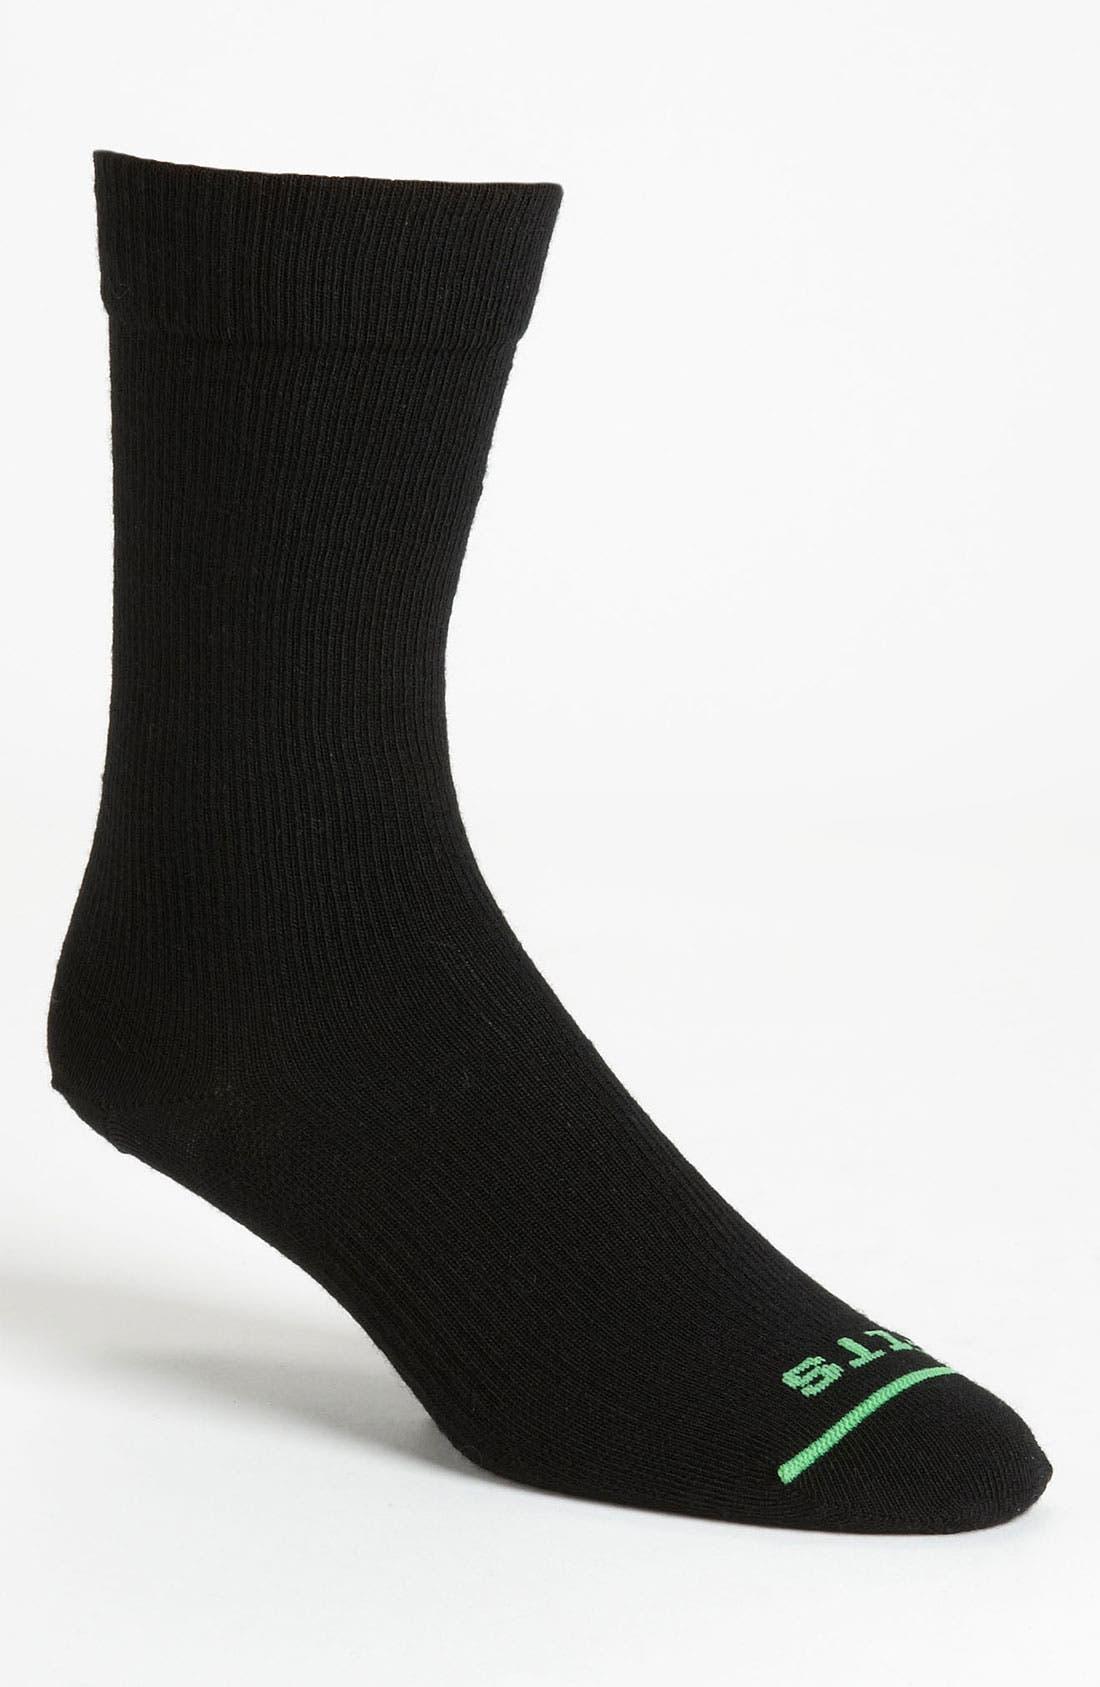 Alternate Image 1 Selected - FITS Sock Co. 'Liner' Crew Socks (Online Only)